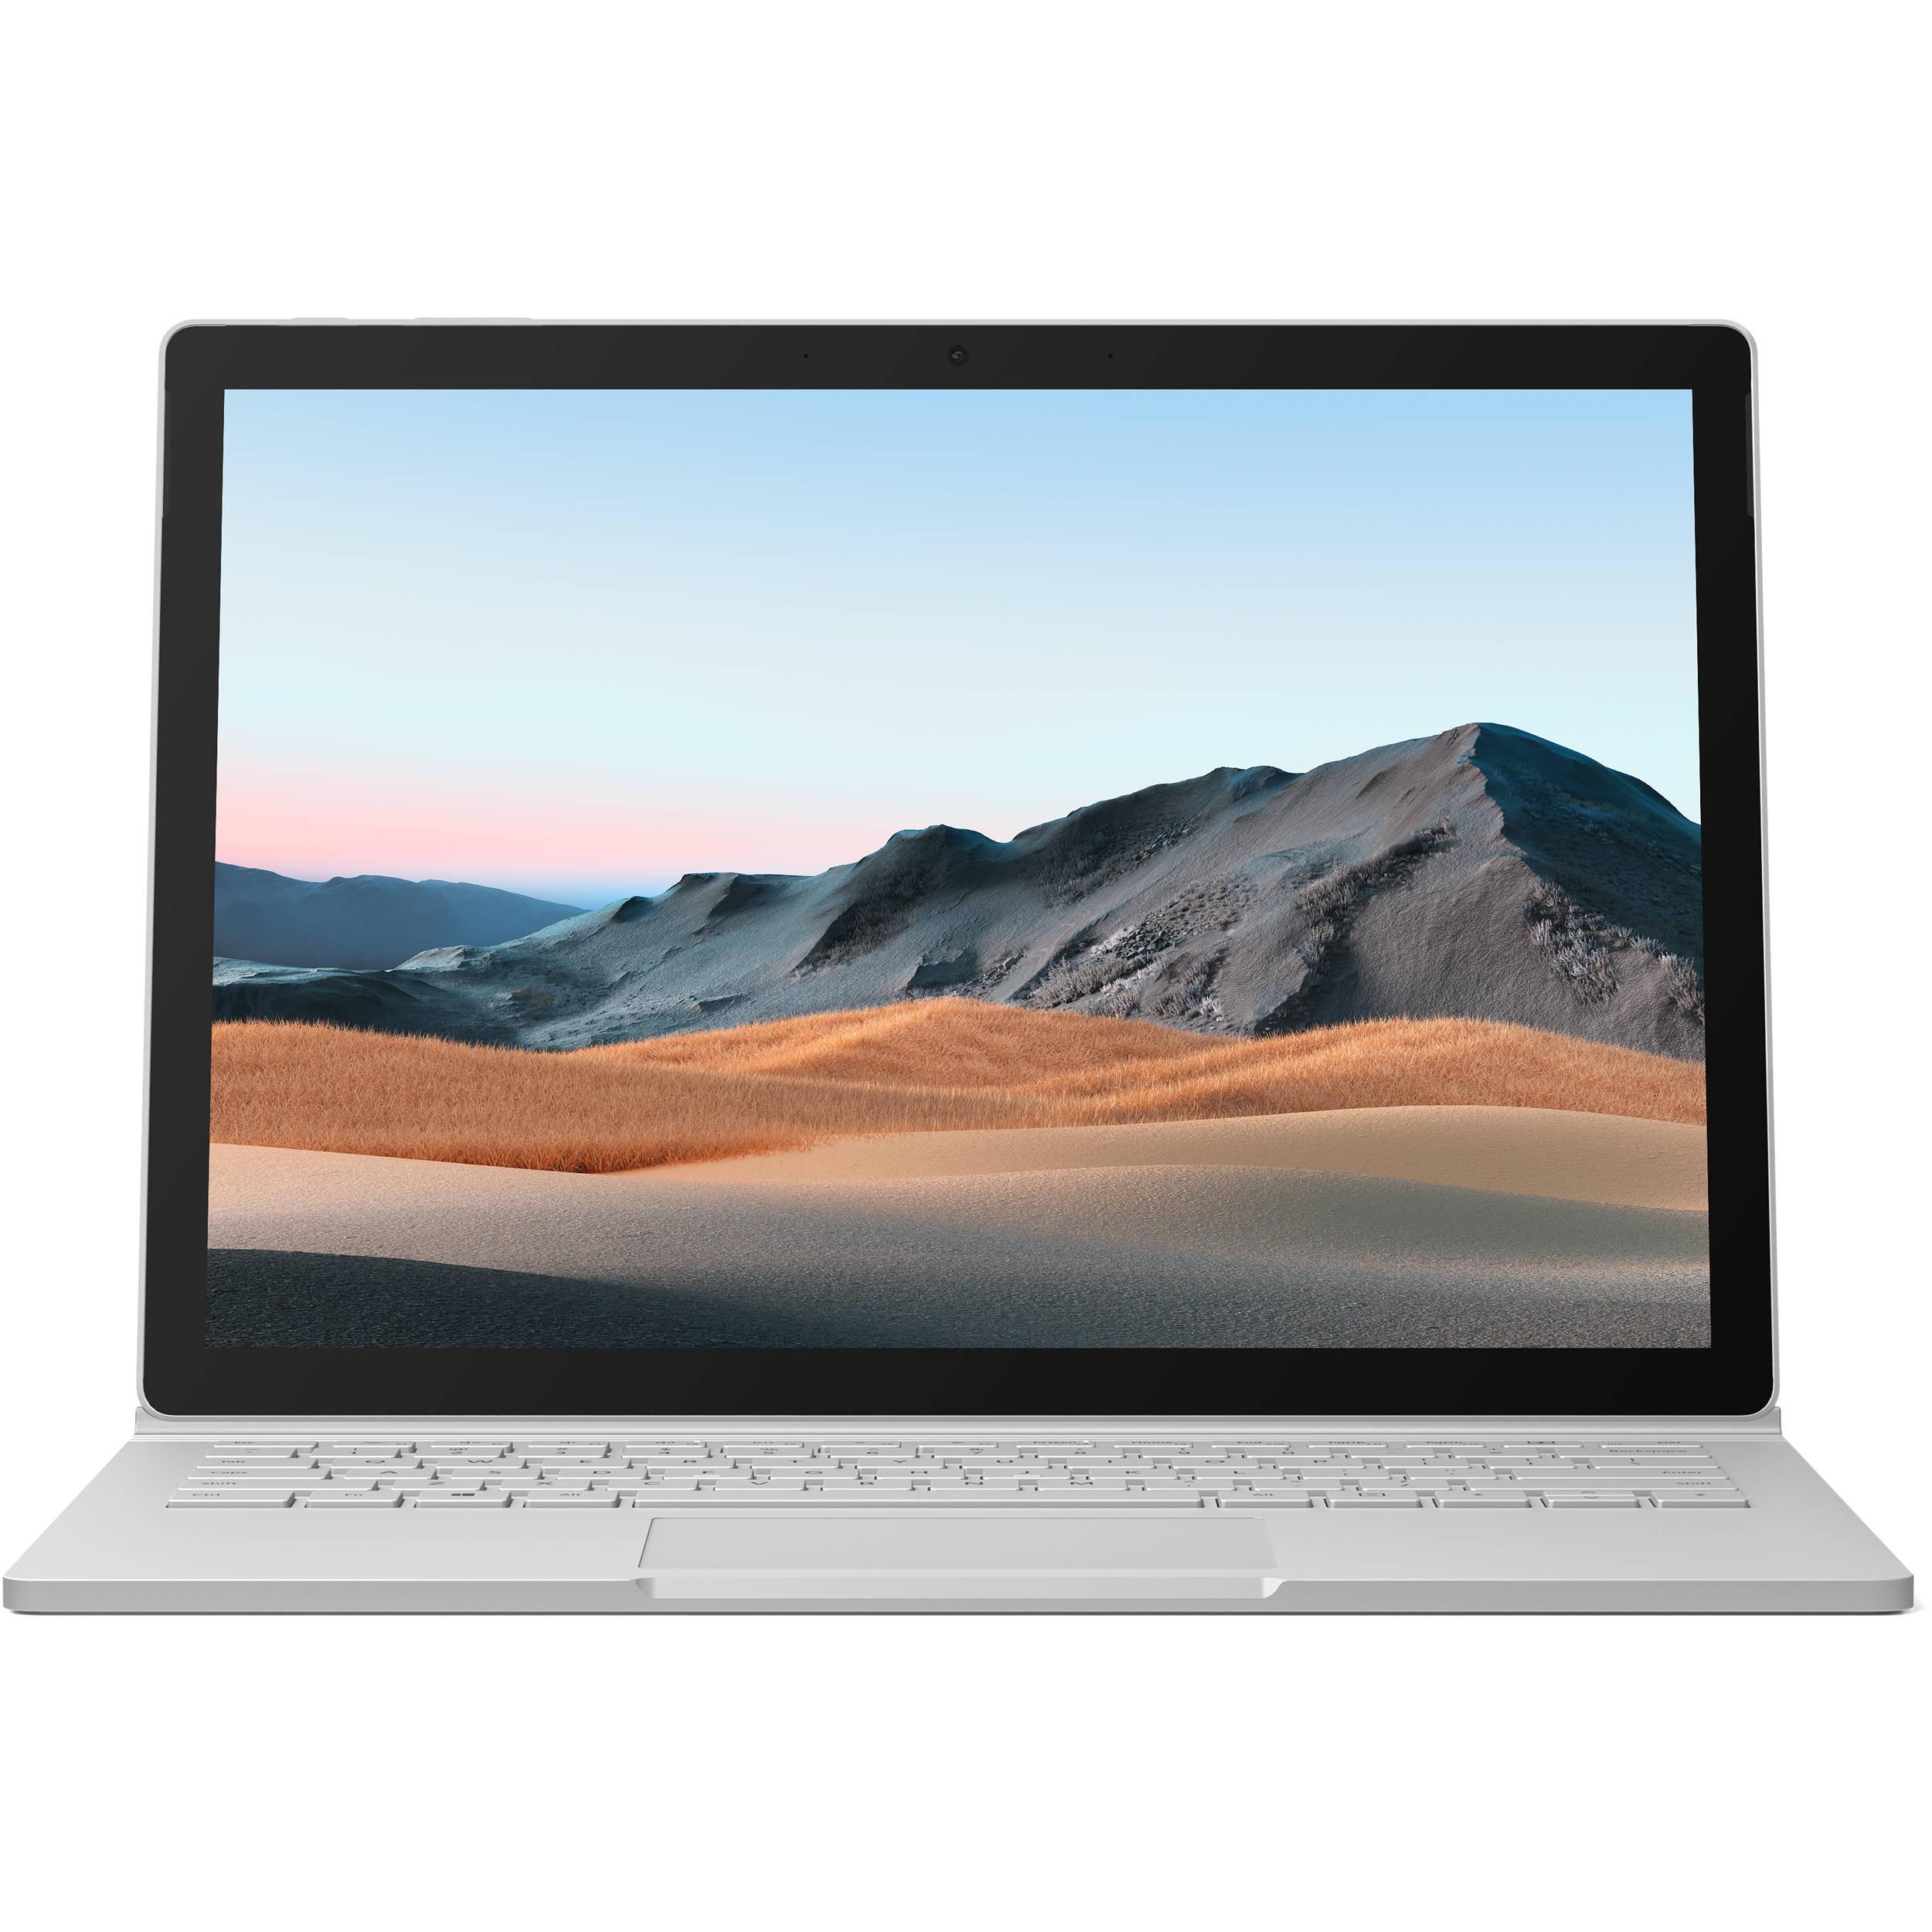 لپ تاپ 13 اینچی مایکروسافت مدل Surface Book 3- F